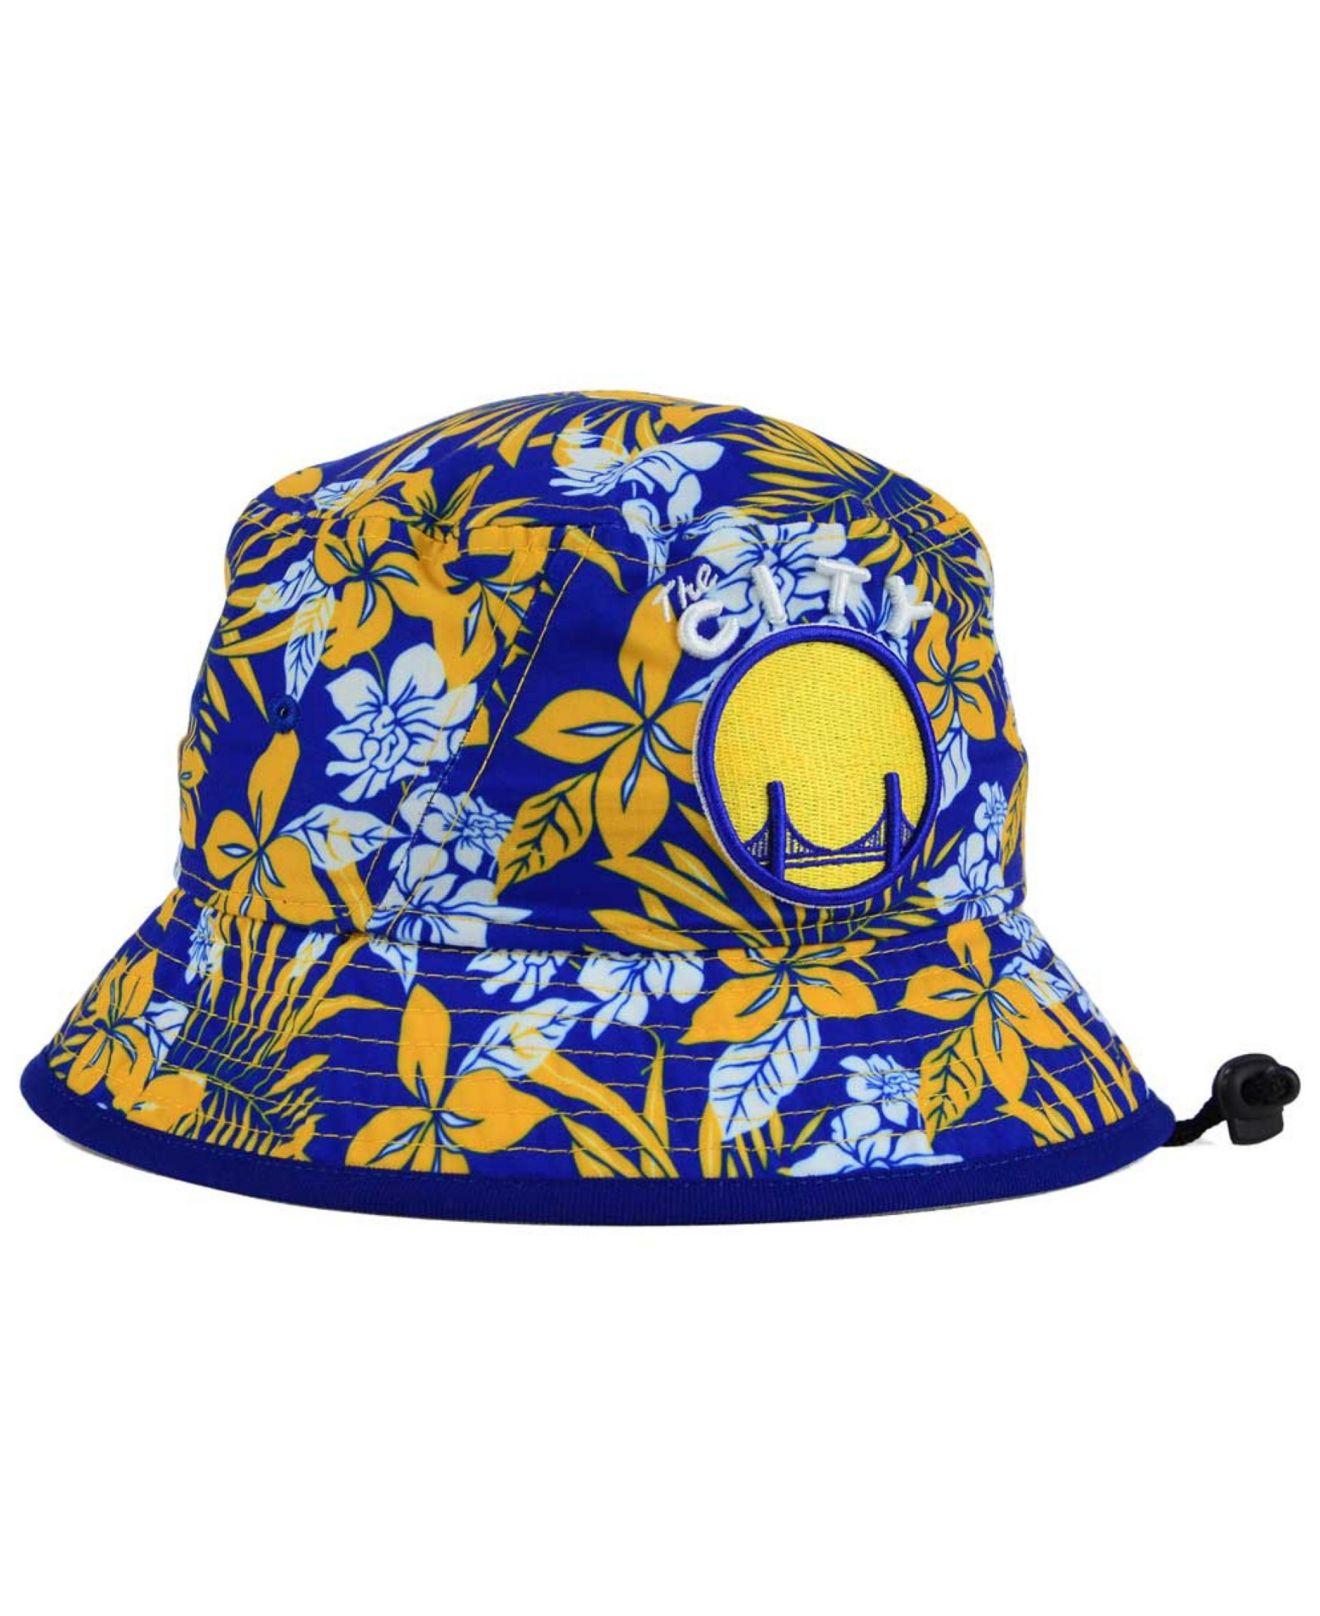 on sale e77cf 14b27 ... uk lyst ktz golden state warriors wowie bucket hat in blue for men  fb1f0 7dce8